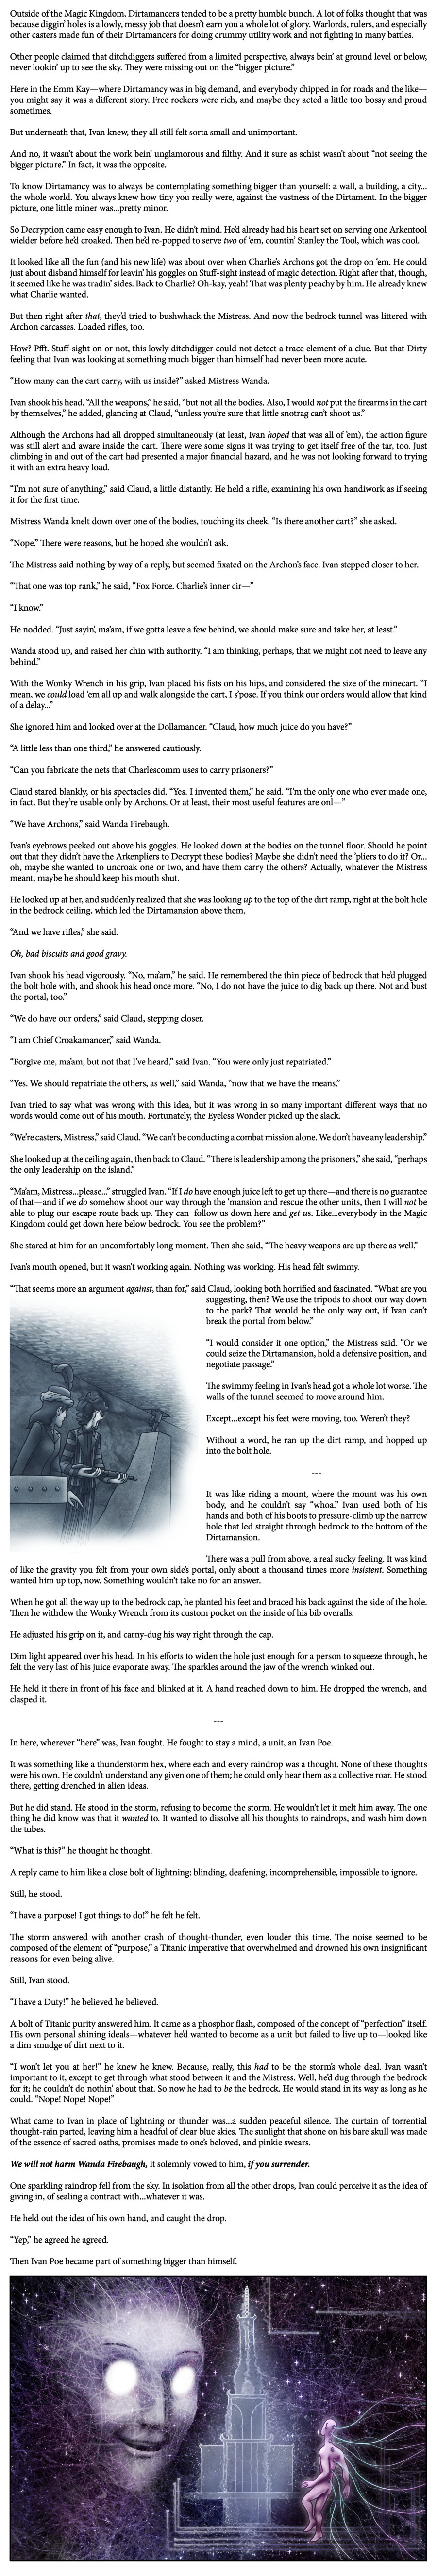 Comic - Book 4 - Page 120